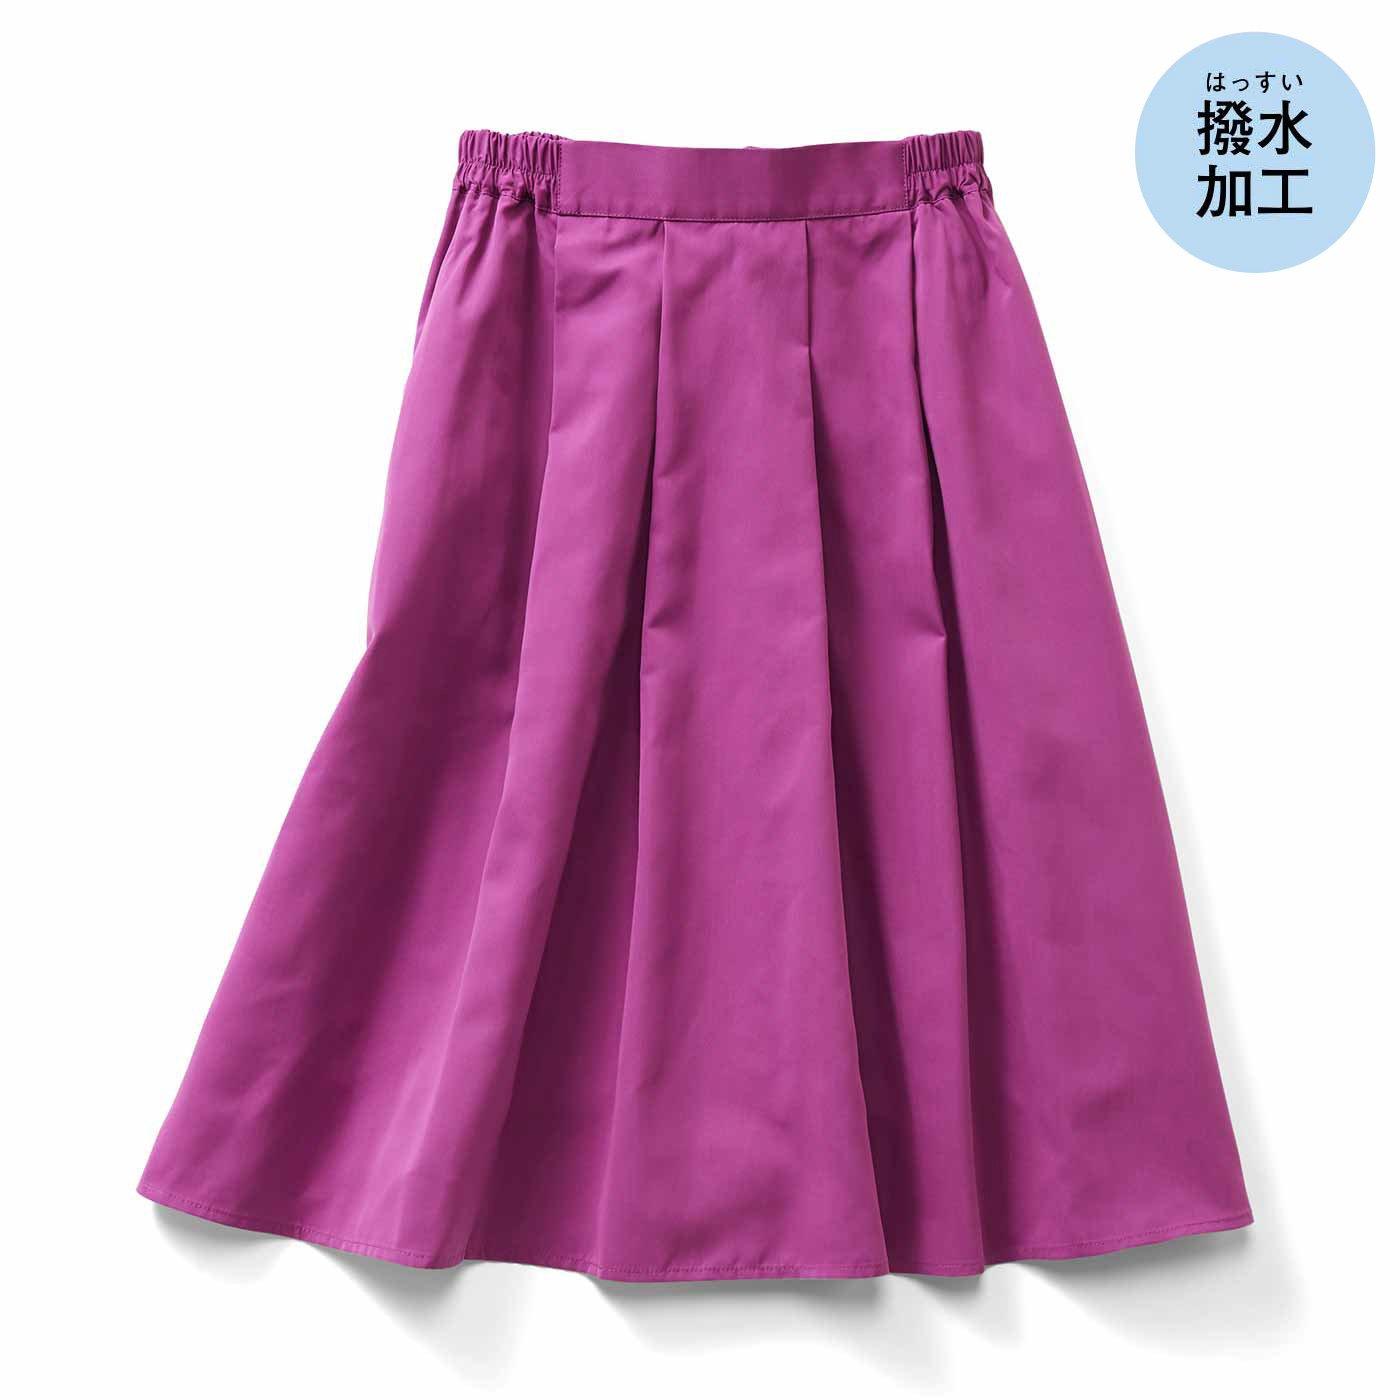 IEDIT[イディット] 撥(はっ)水機能できれいをキープする キレイ色Aラインスカート〈ピンク〉